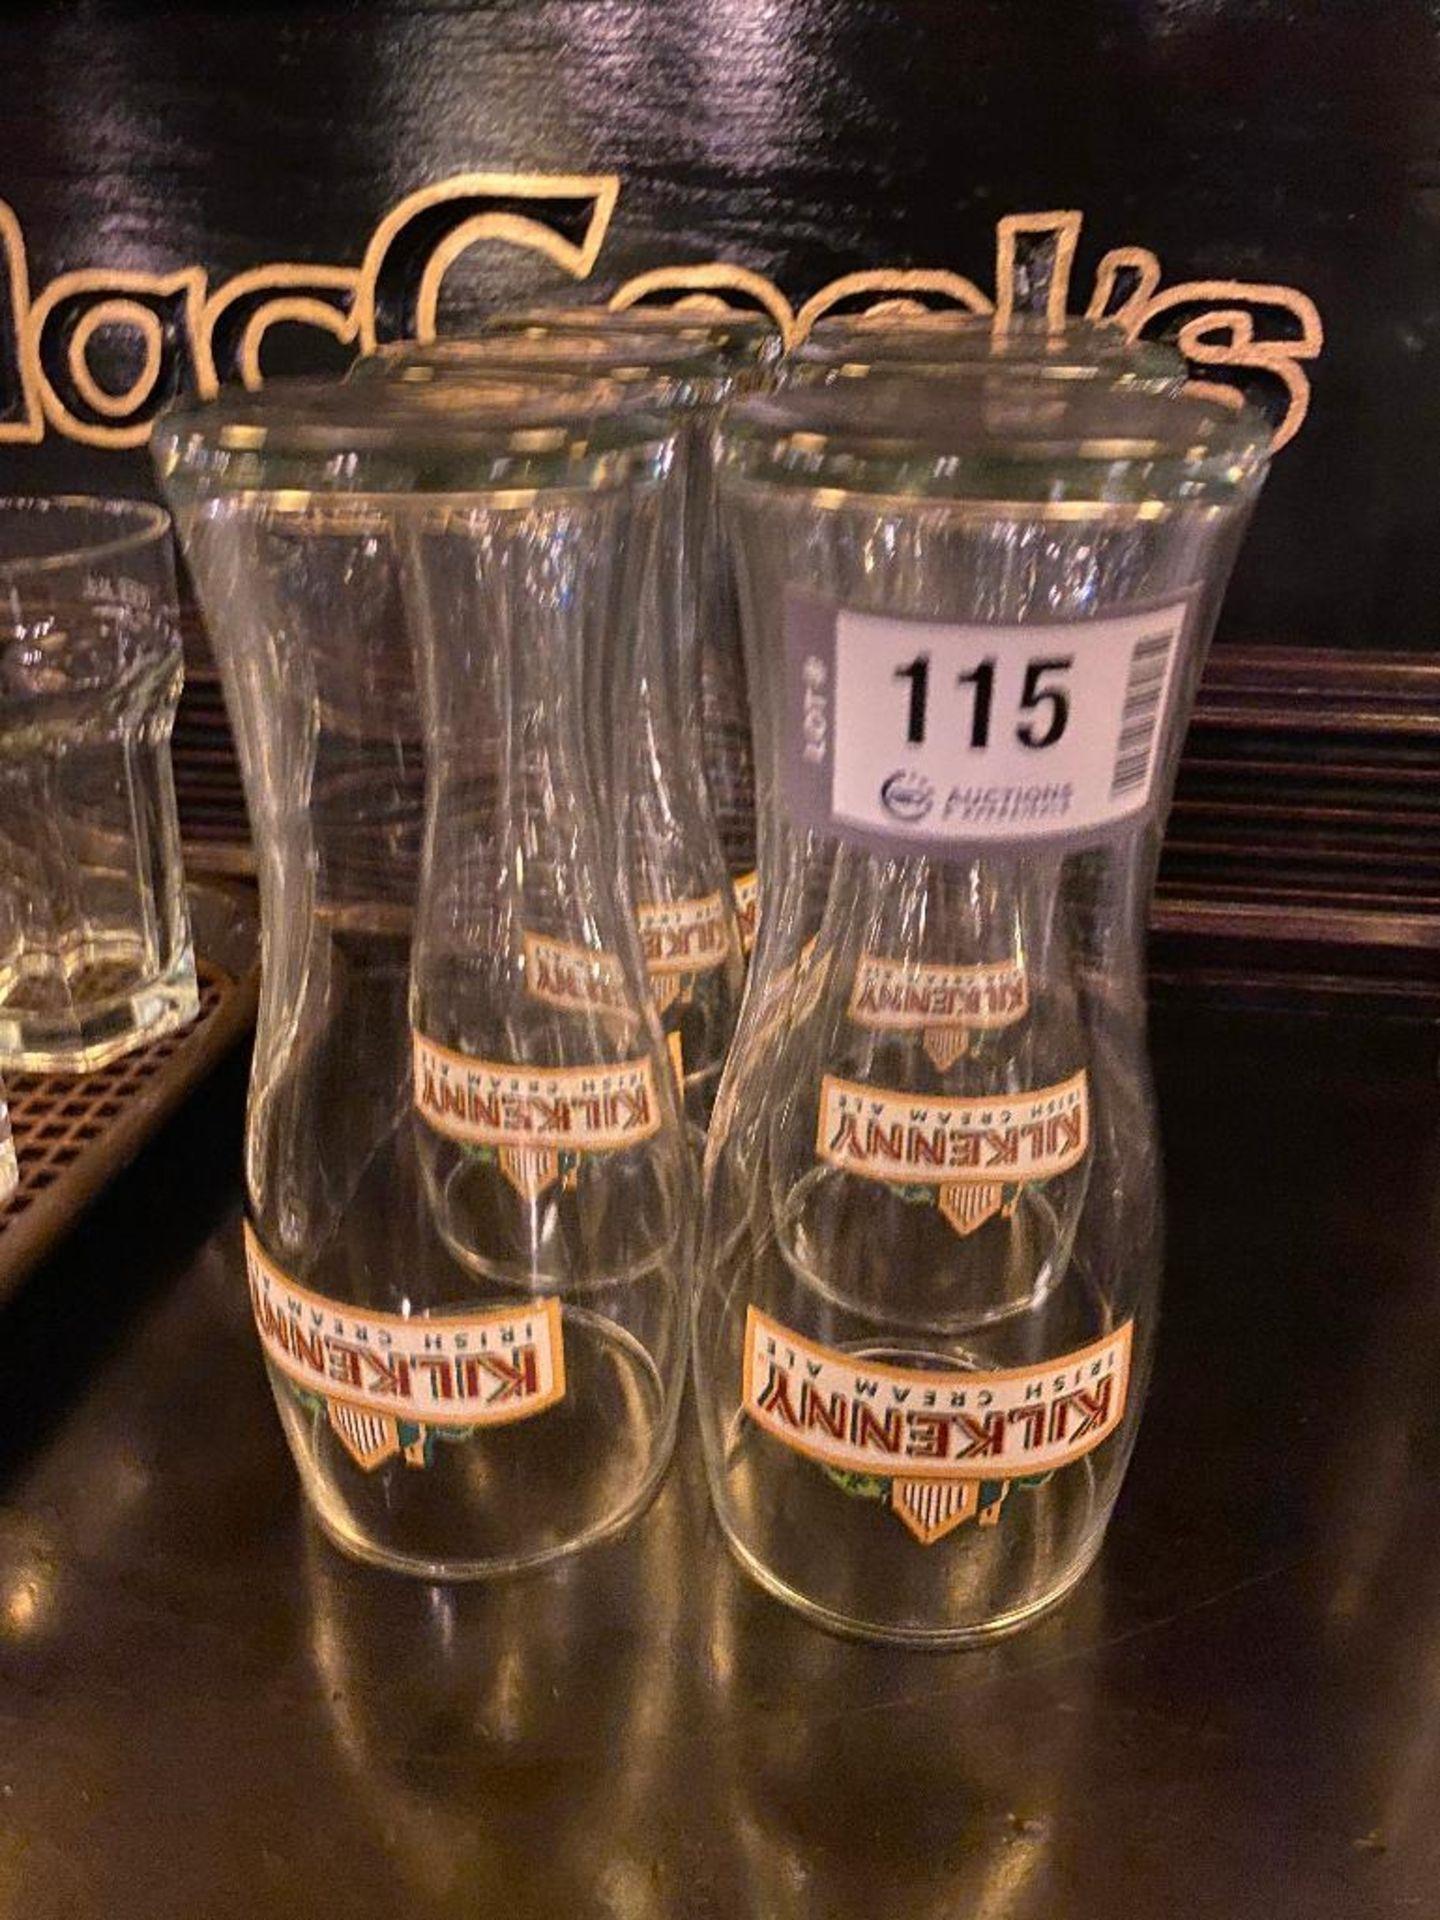 LOT OF (6) KILKENNY IRISH CREAM ALE GLASSES